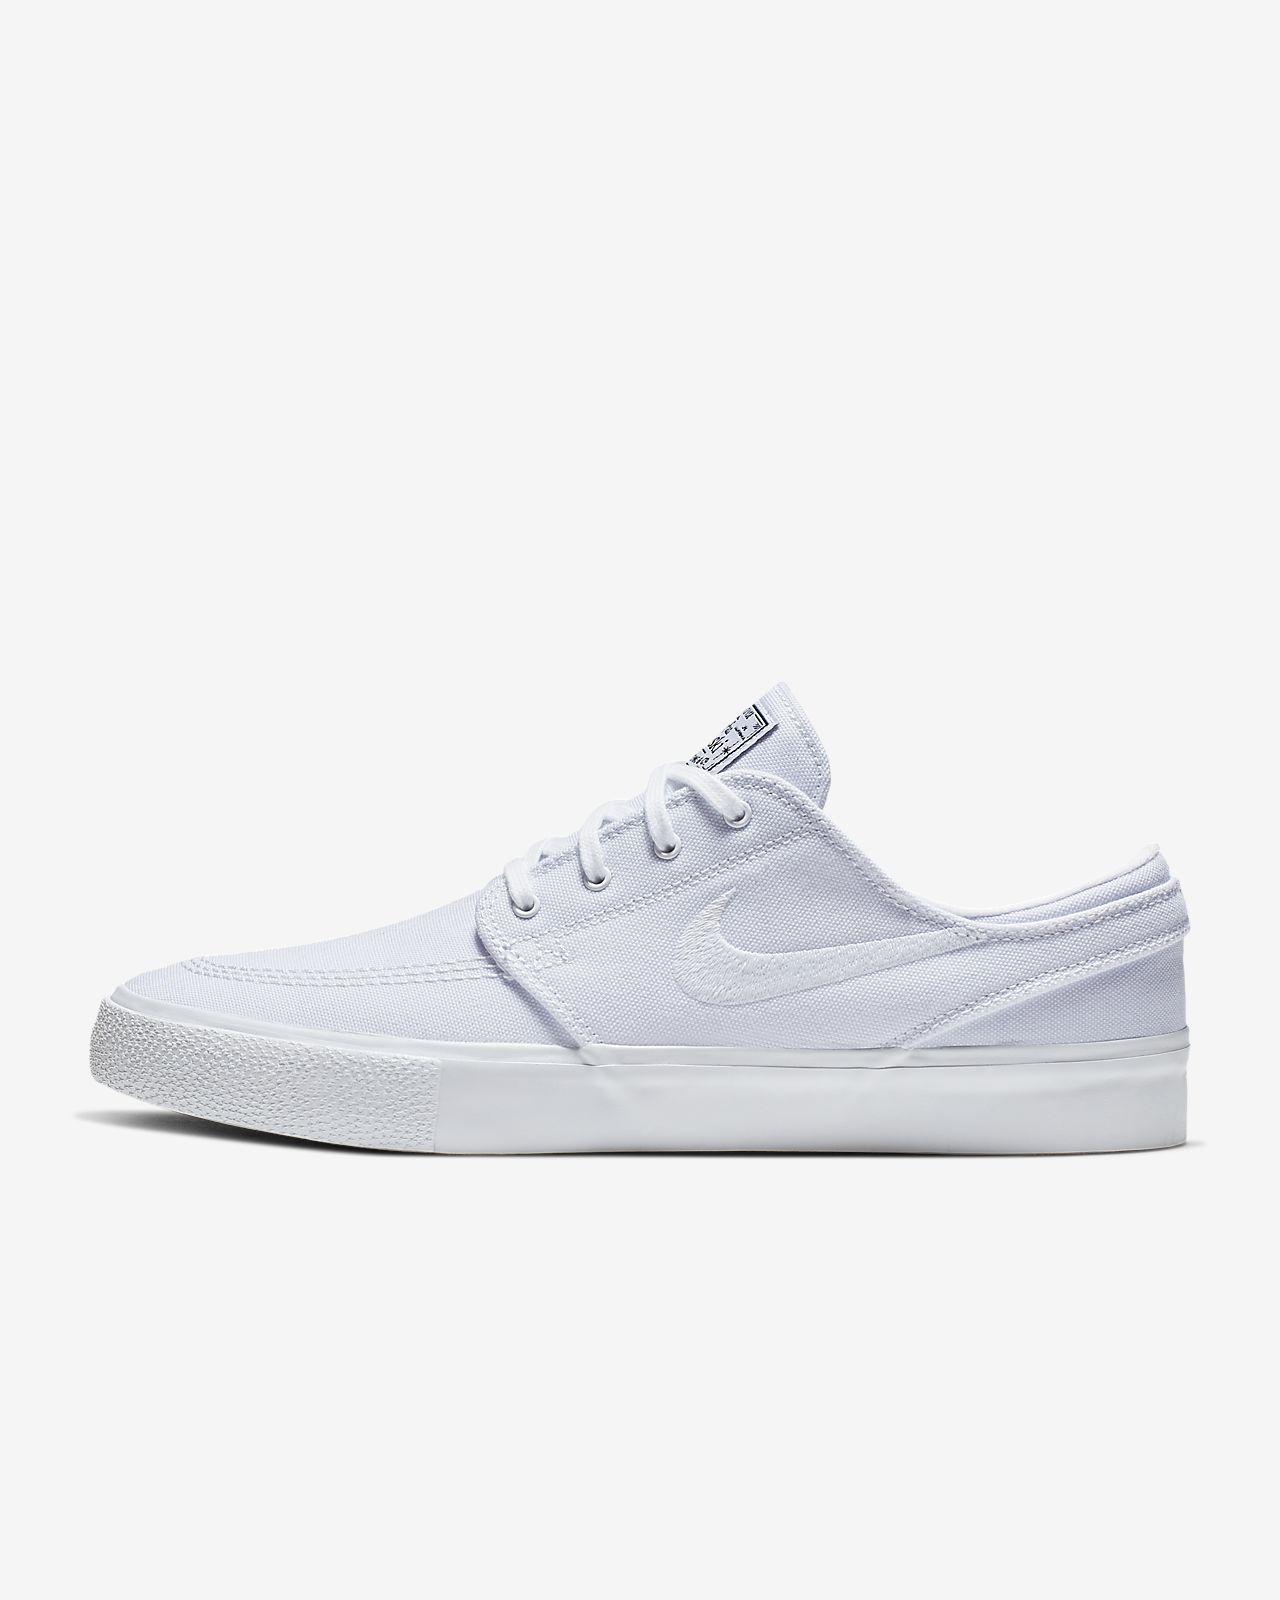 Branco Skateboard Sapatilhas. Nike PT